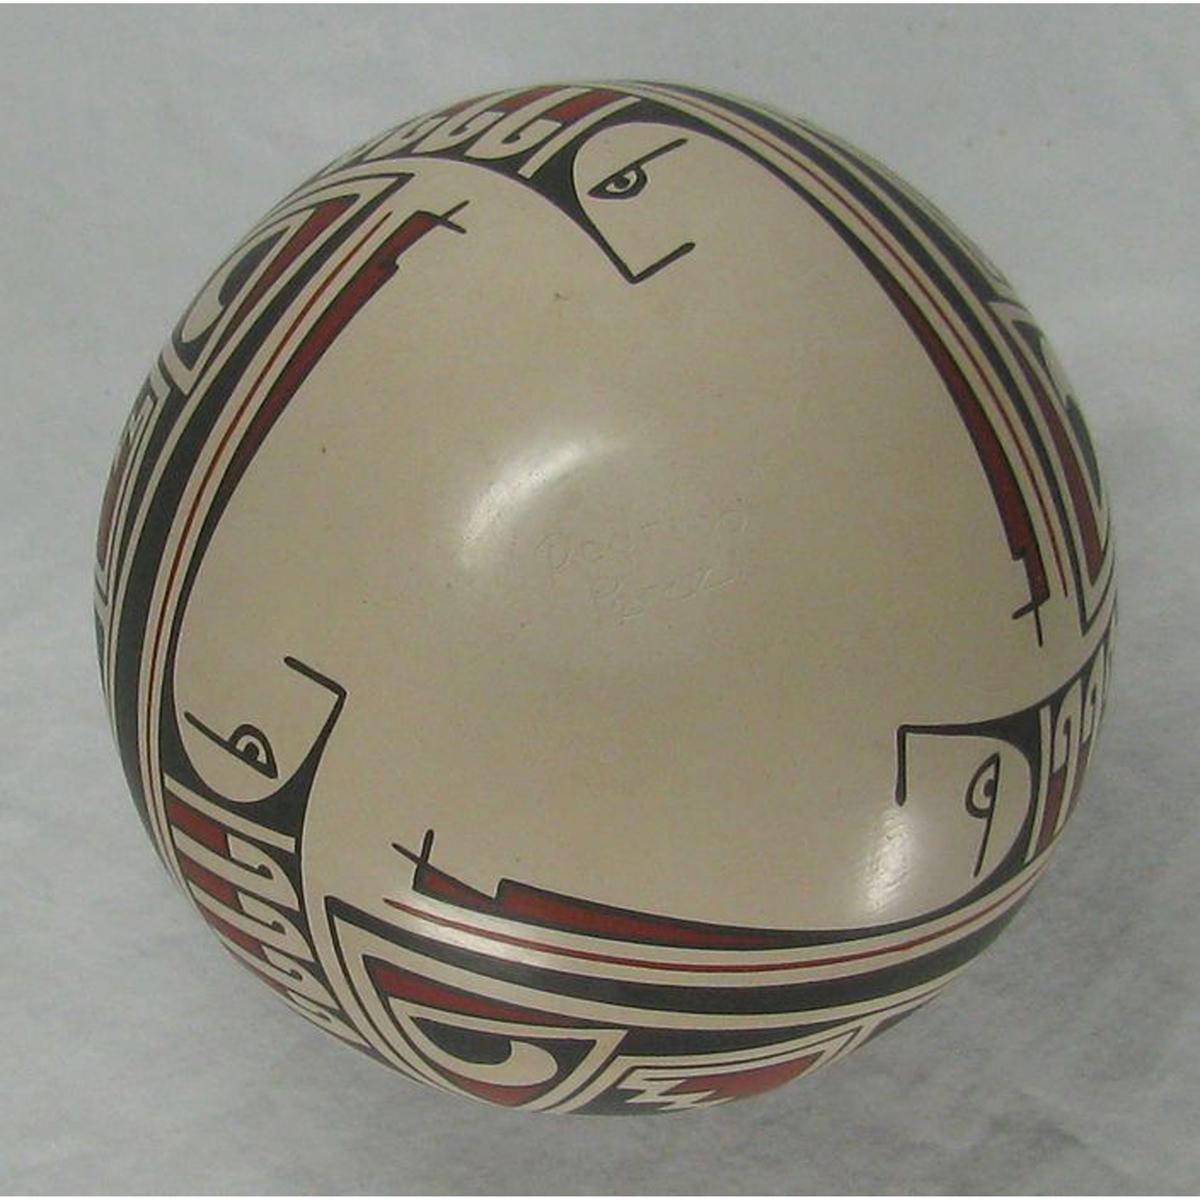 Mata Ortiz Pottery by Rodrigo Perez